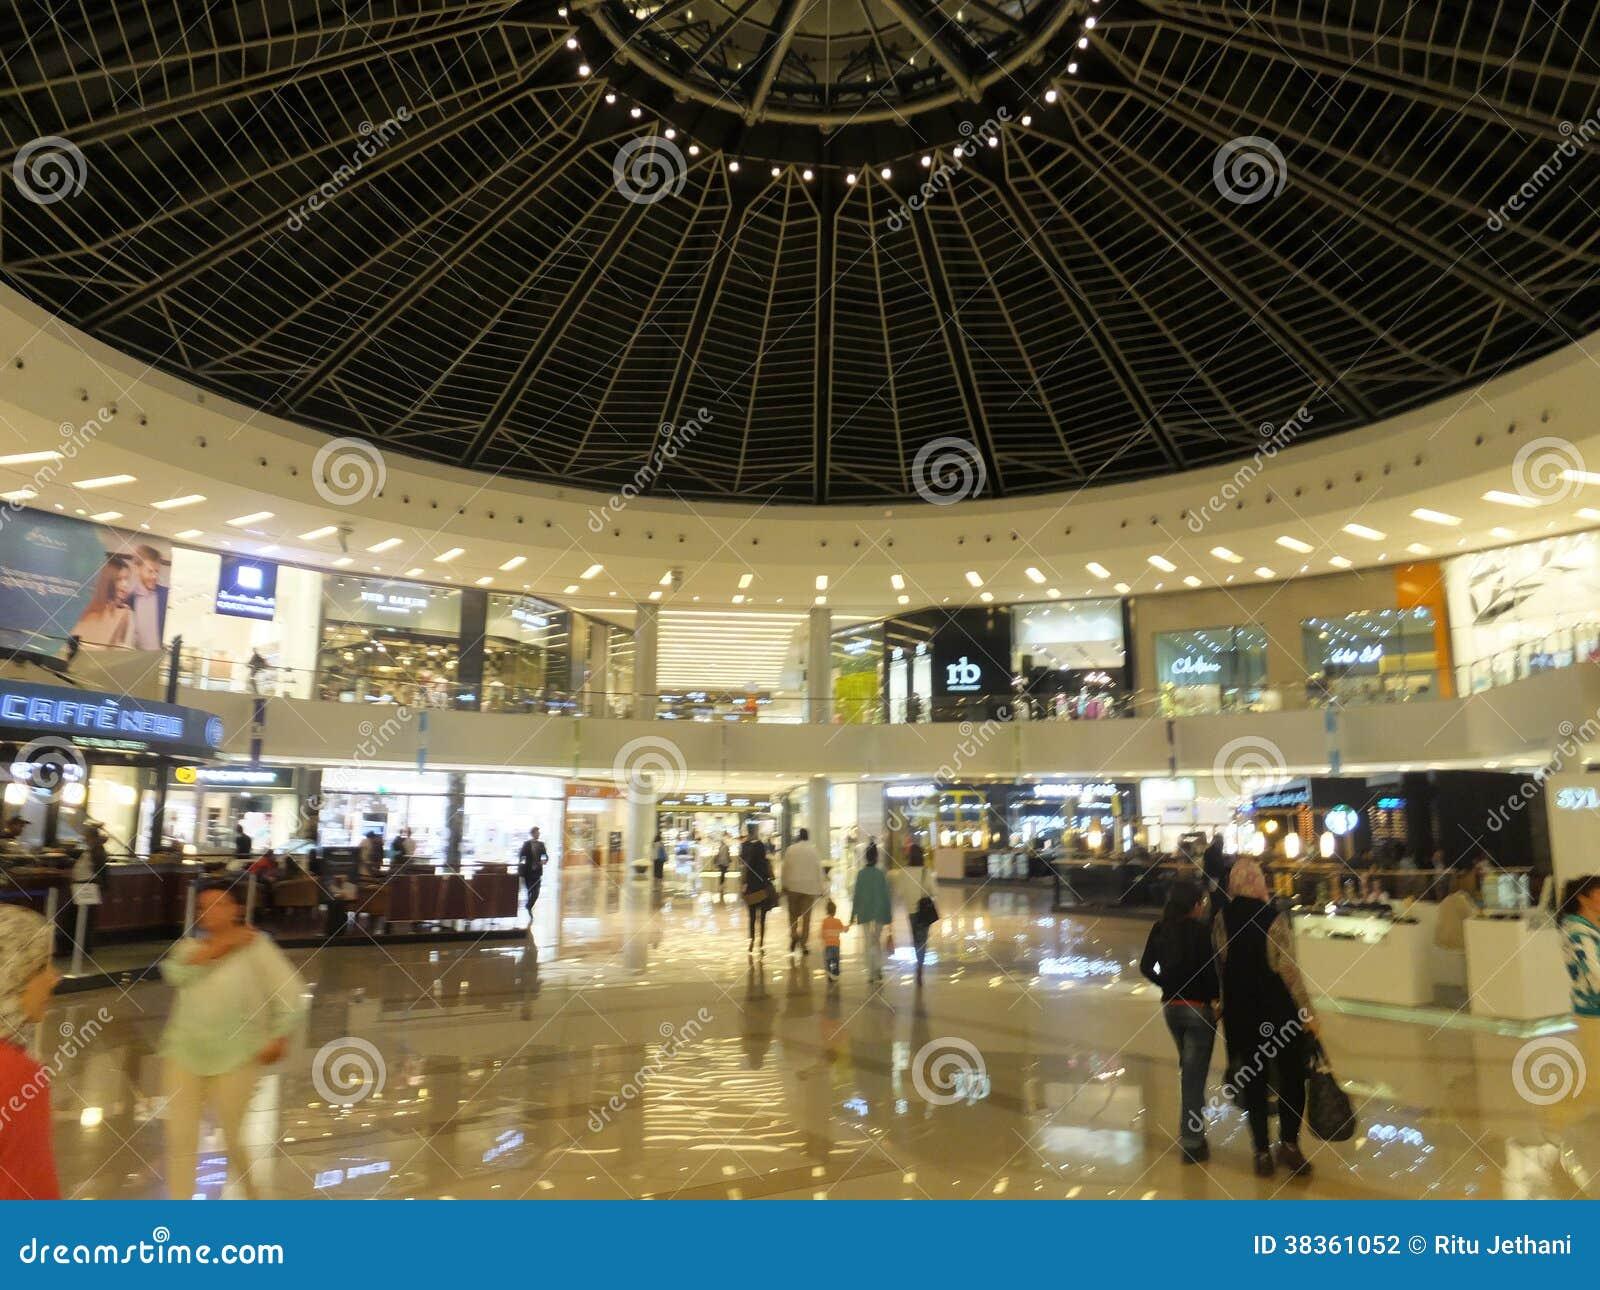 Dubai Marina Mall In The Uae Editorial Photography Image 38361052